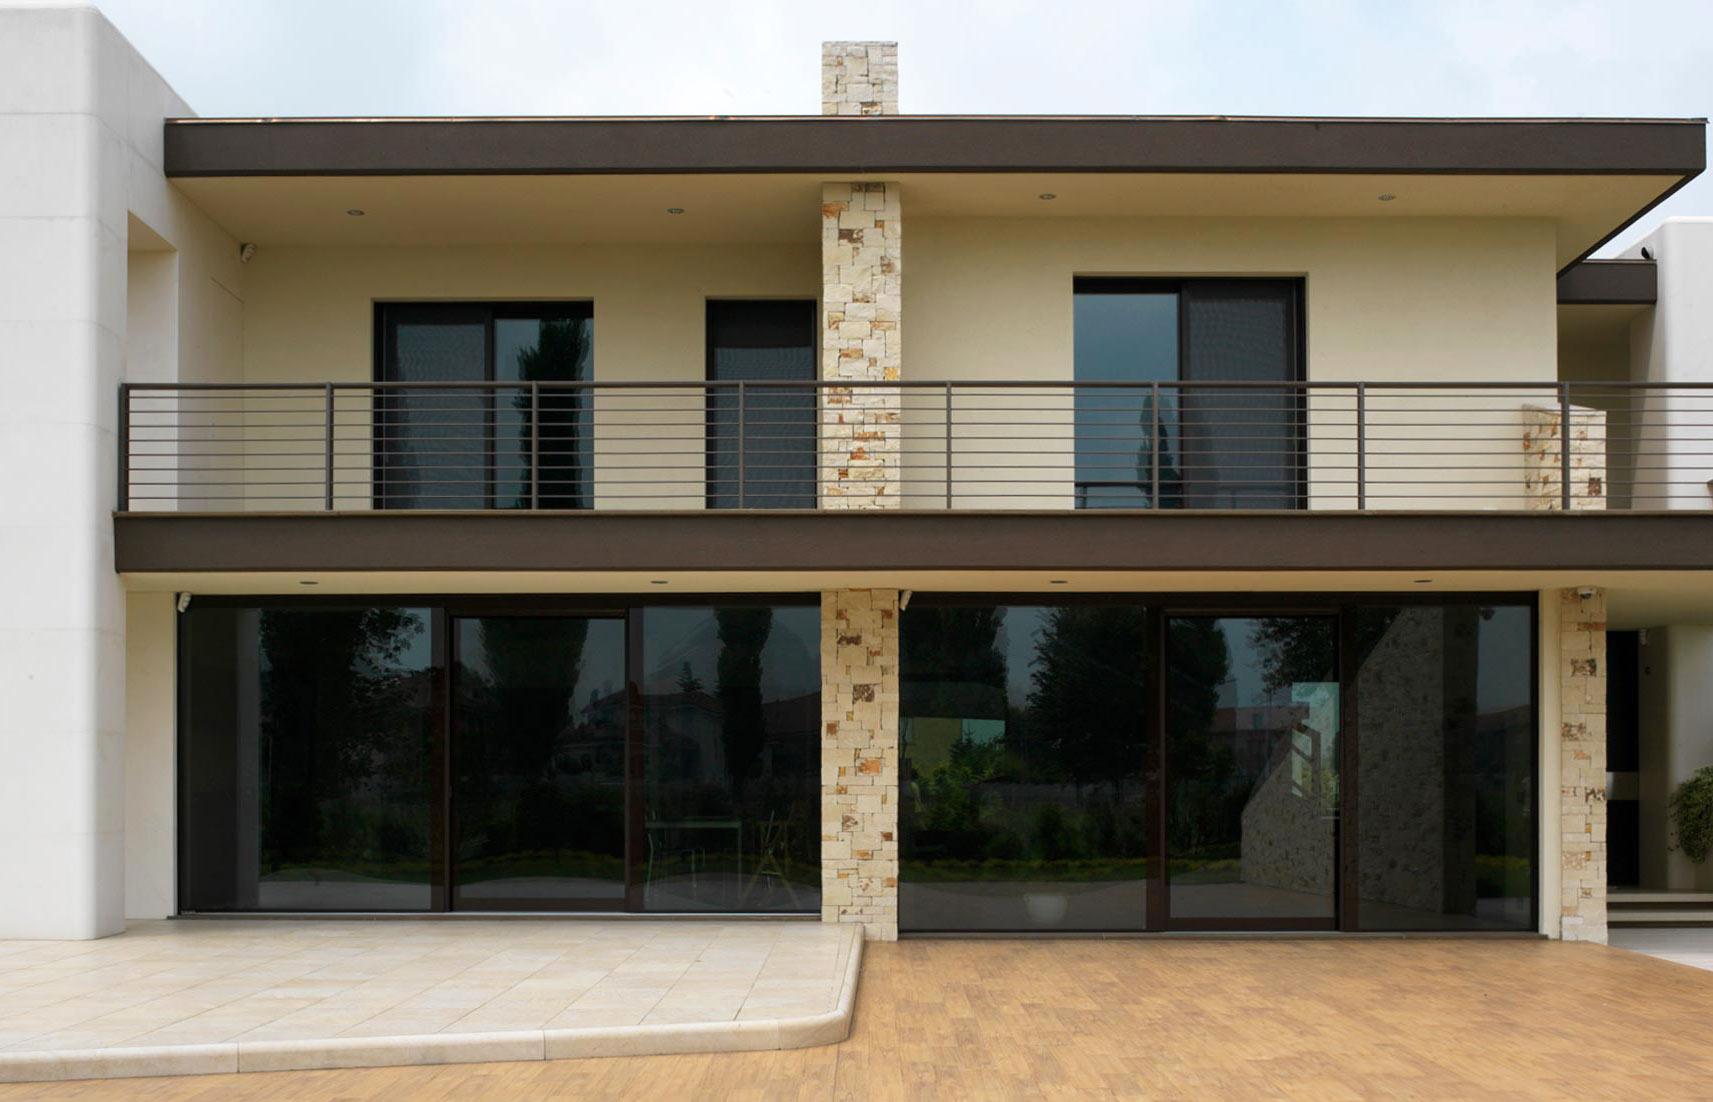 Building elevation with Vitrum 90 windows